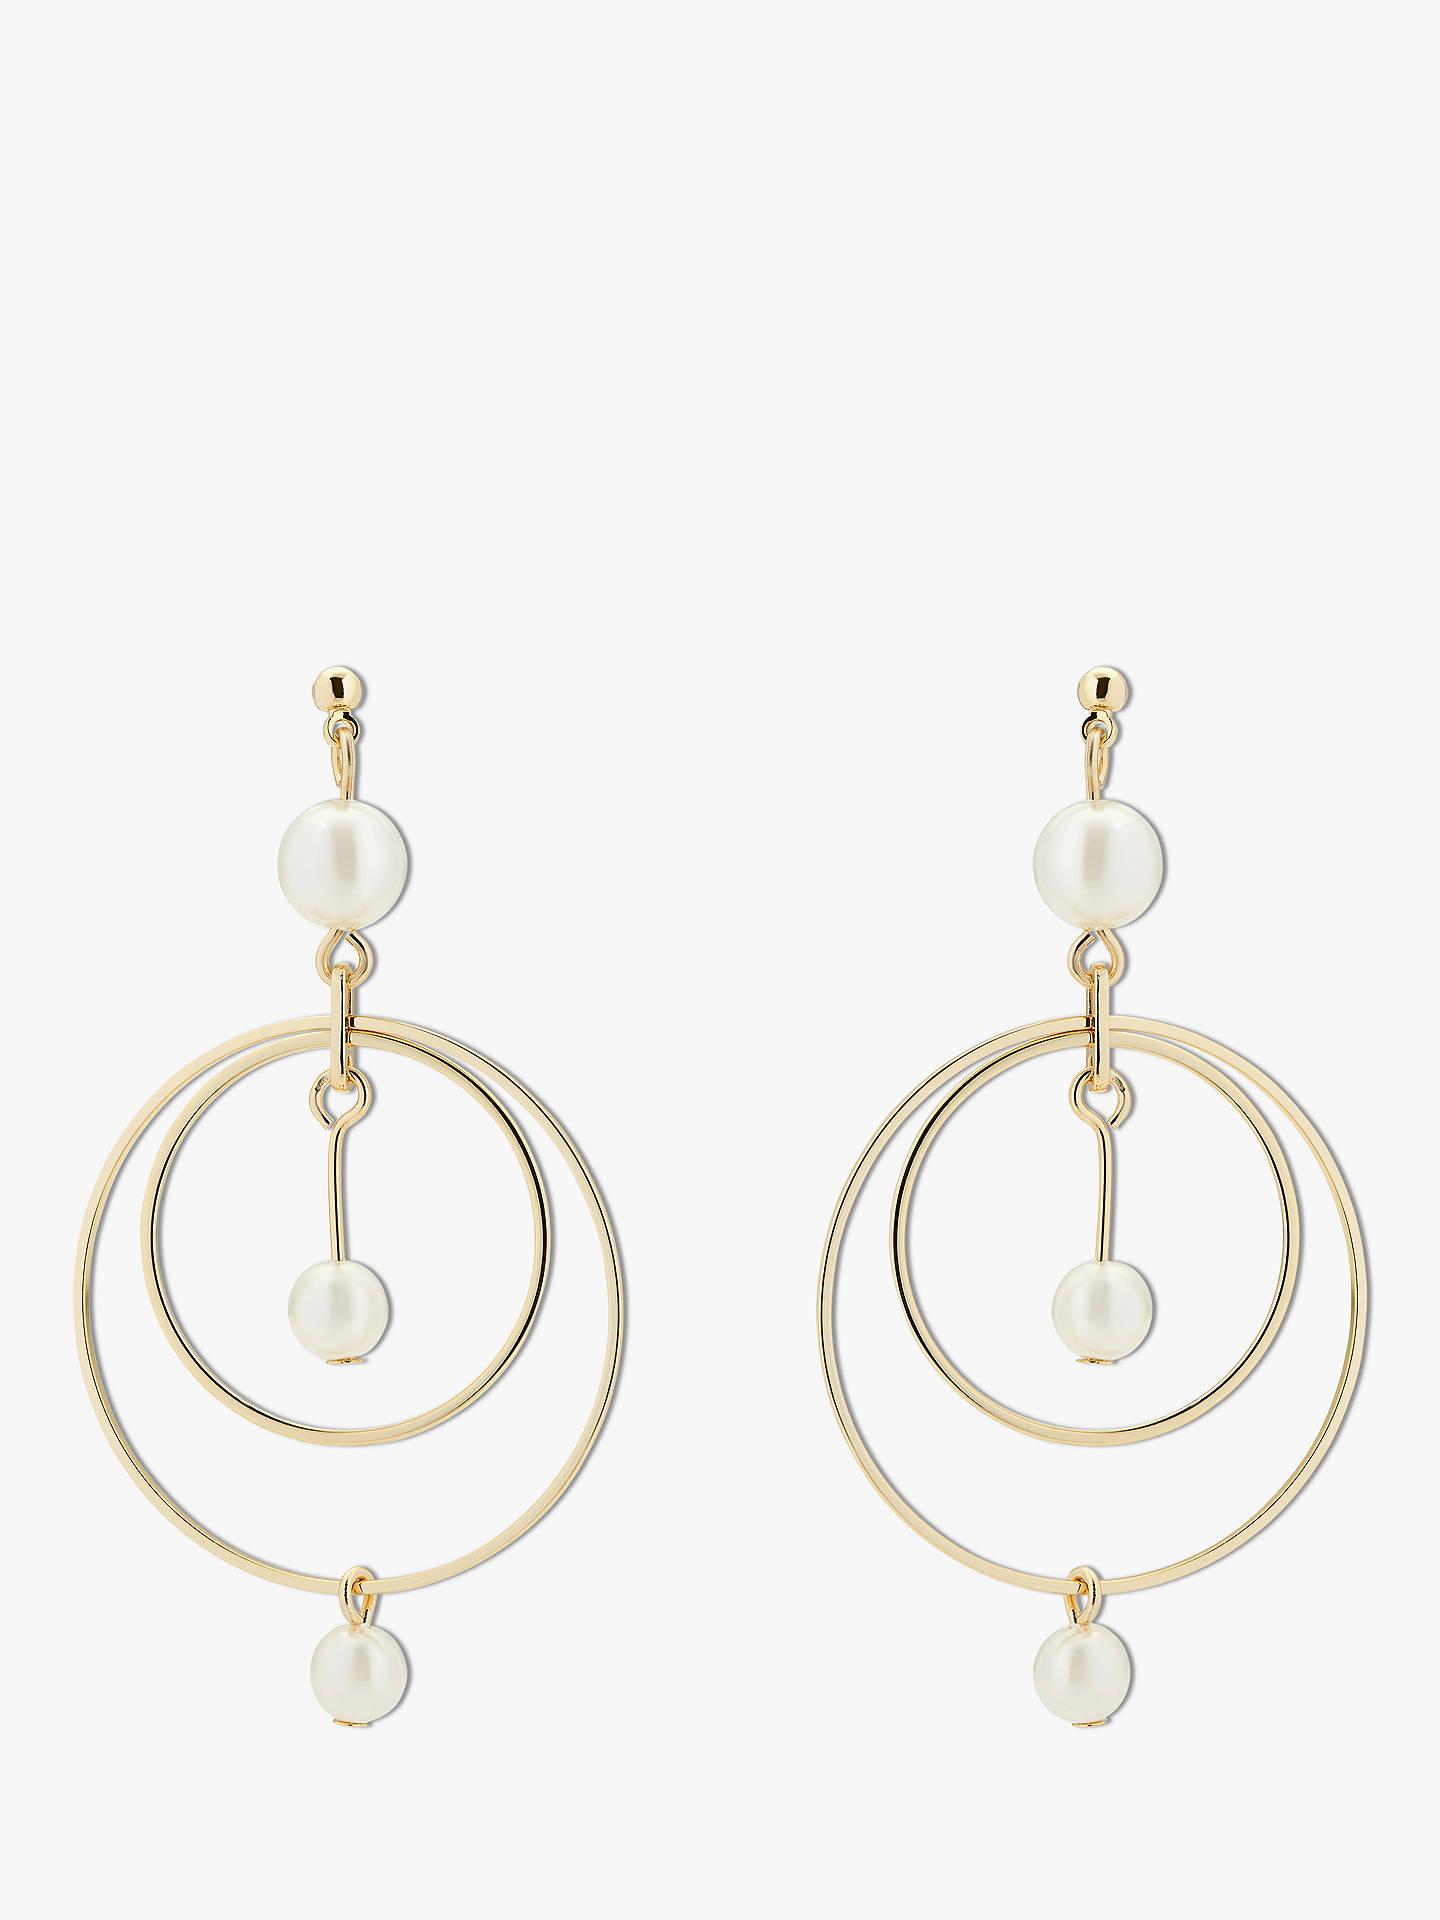 250c23d8337 Buy Karen Millen Faux Pearl Double Circle Drop Earrings